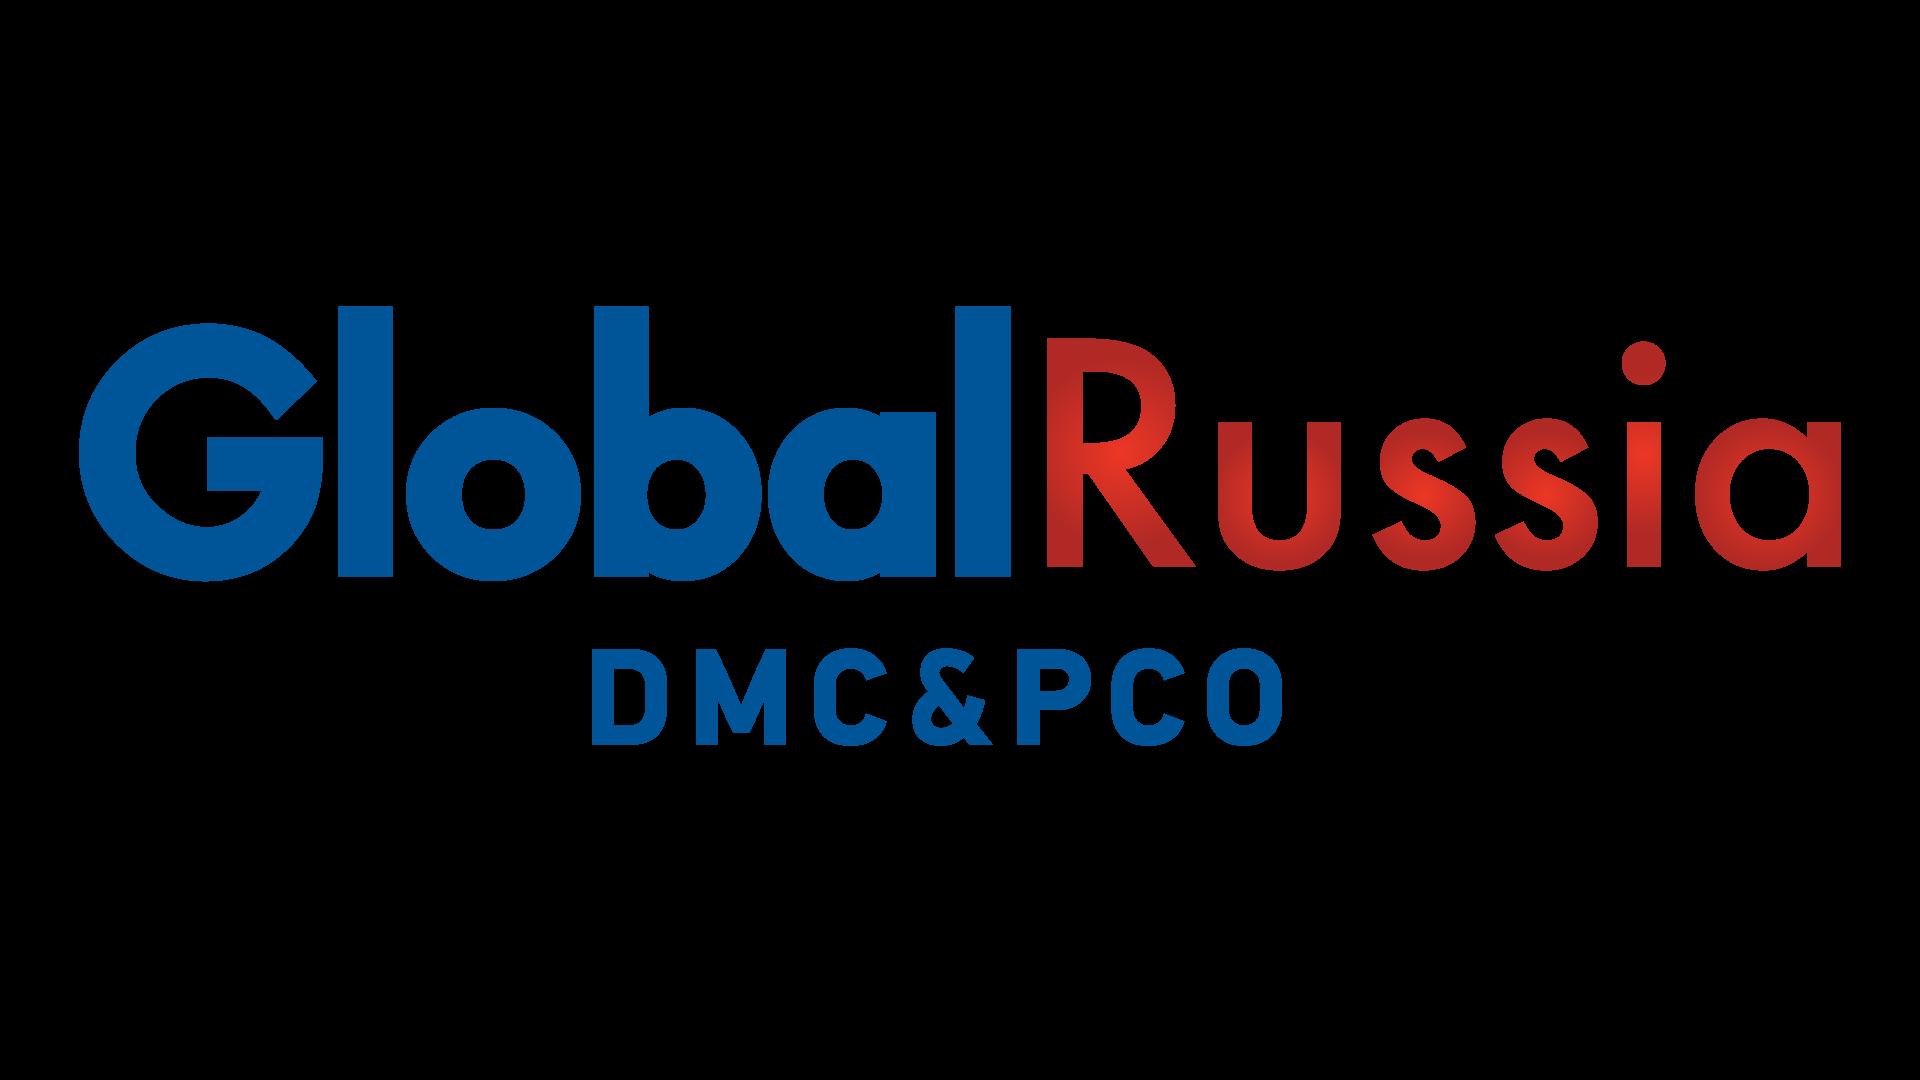 Global Russia DMC & PCO